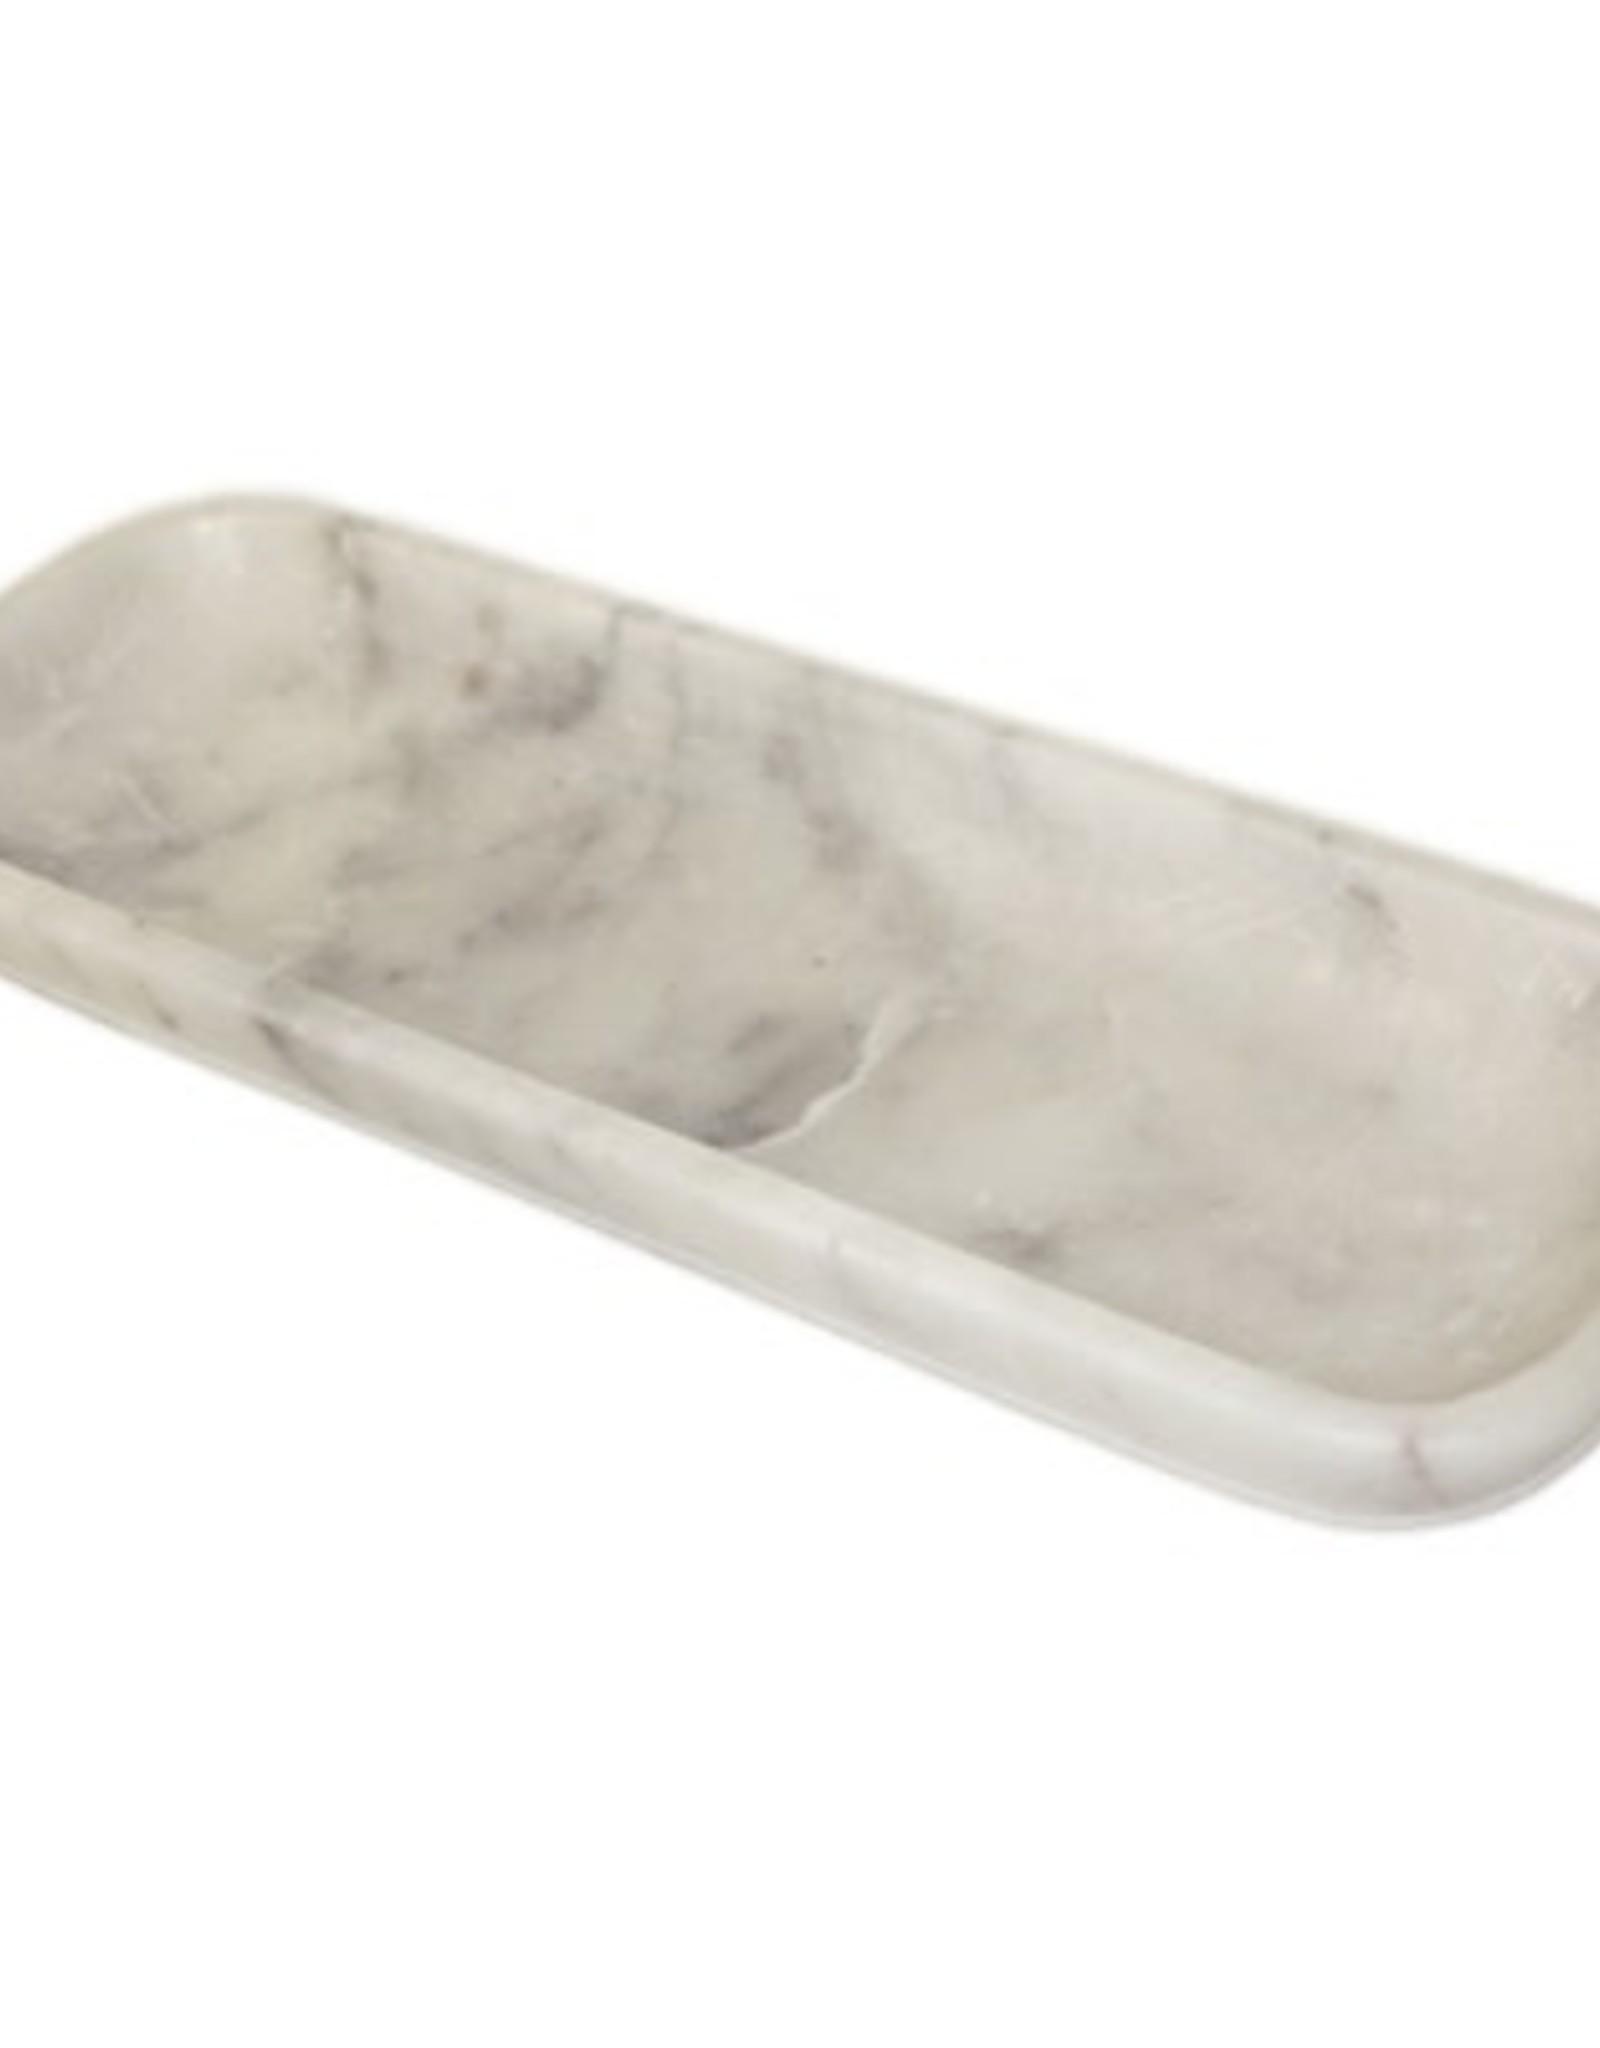 BIDK Home Marble Organic Rectangle Bowl-White